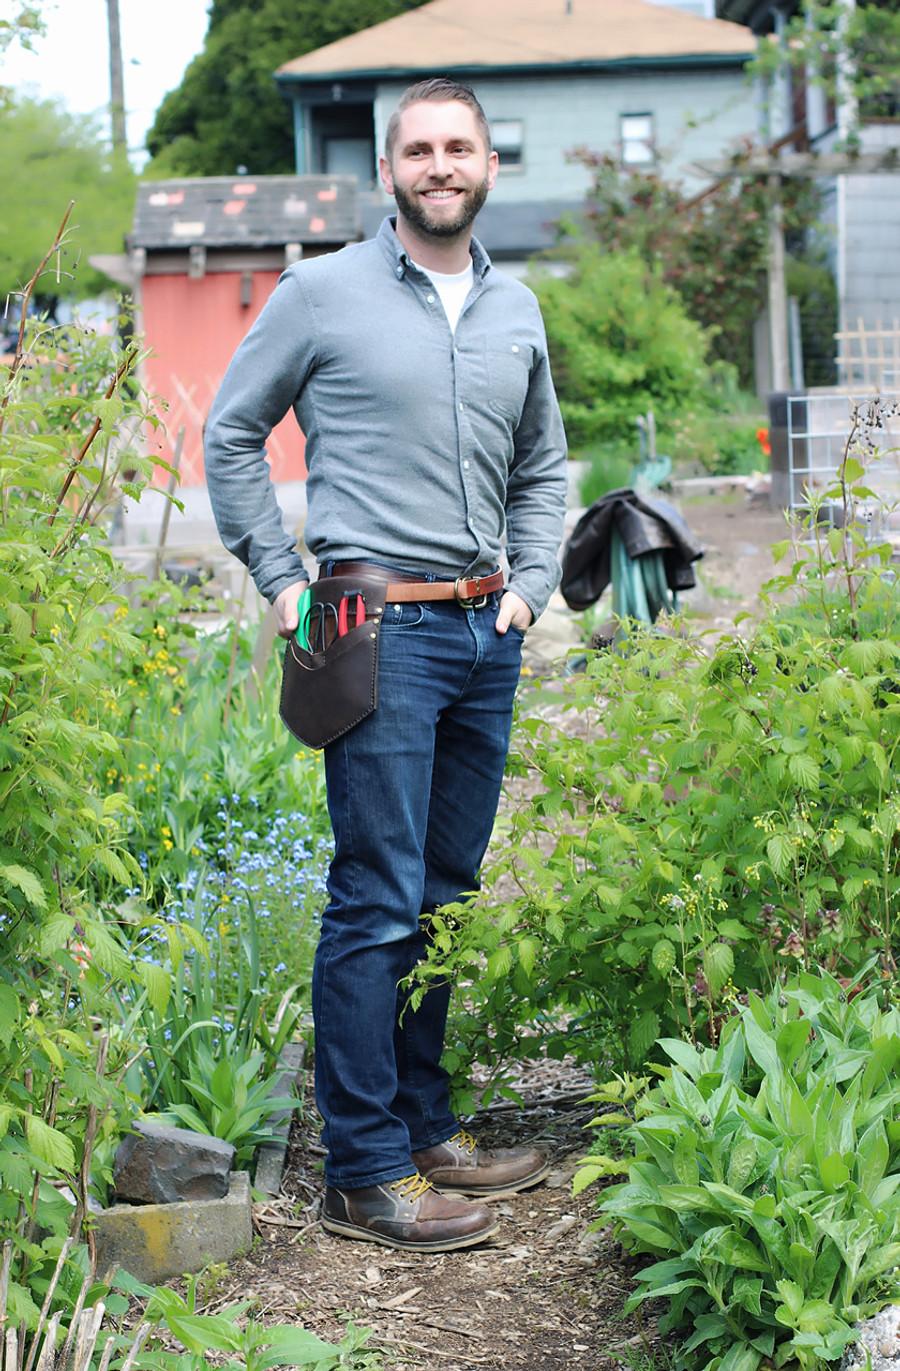 Seattle Seed Co. founder Sander wearing his Harvest Essentials belt.